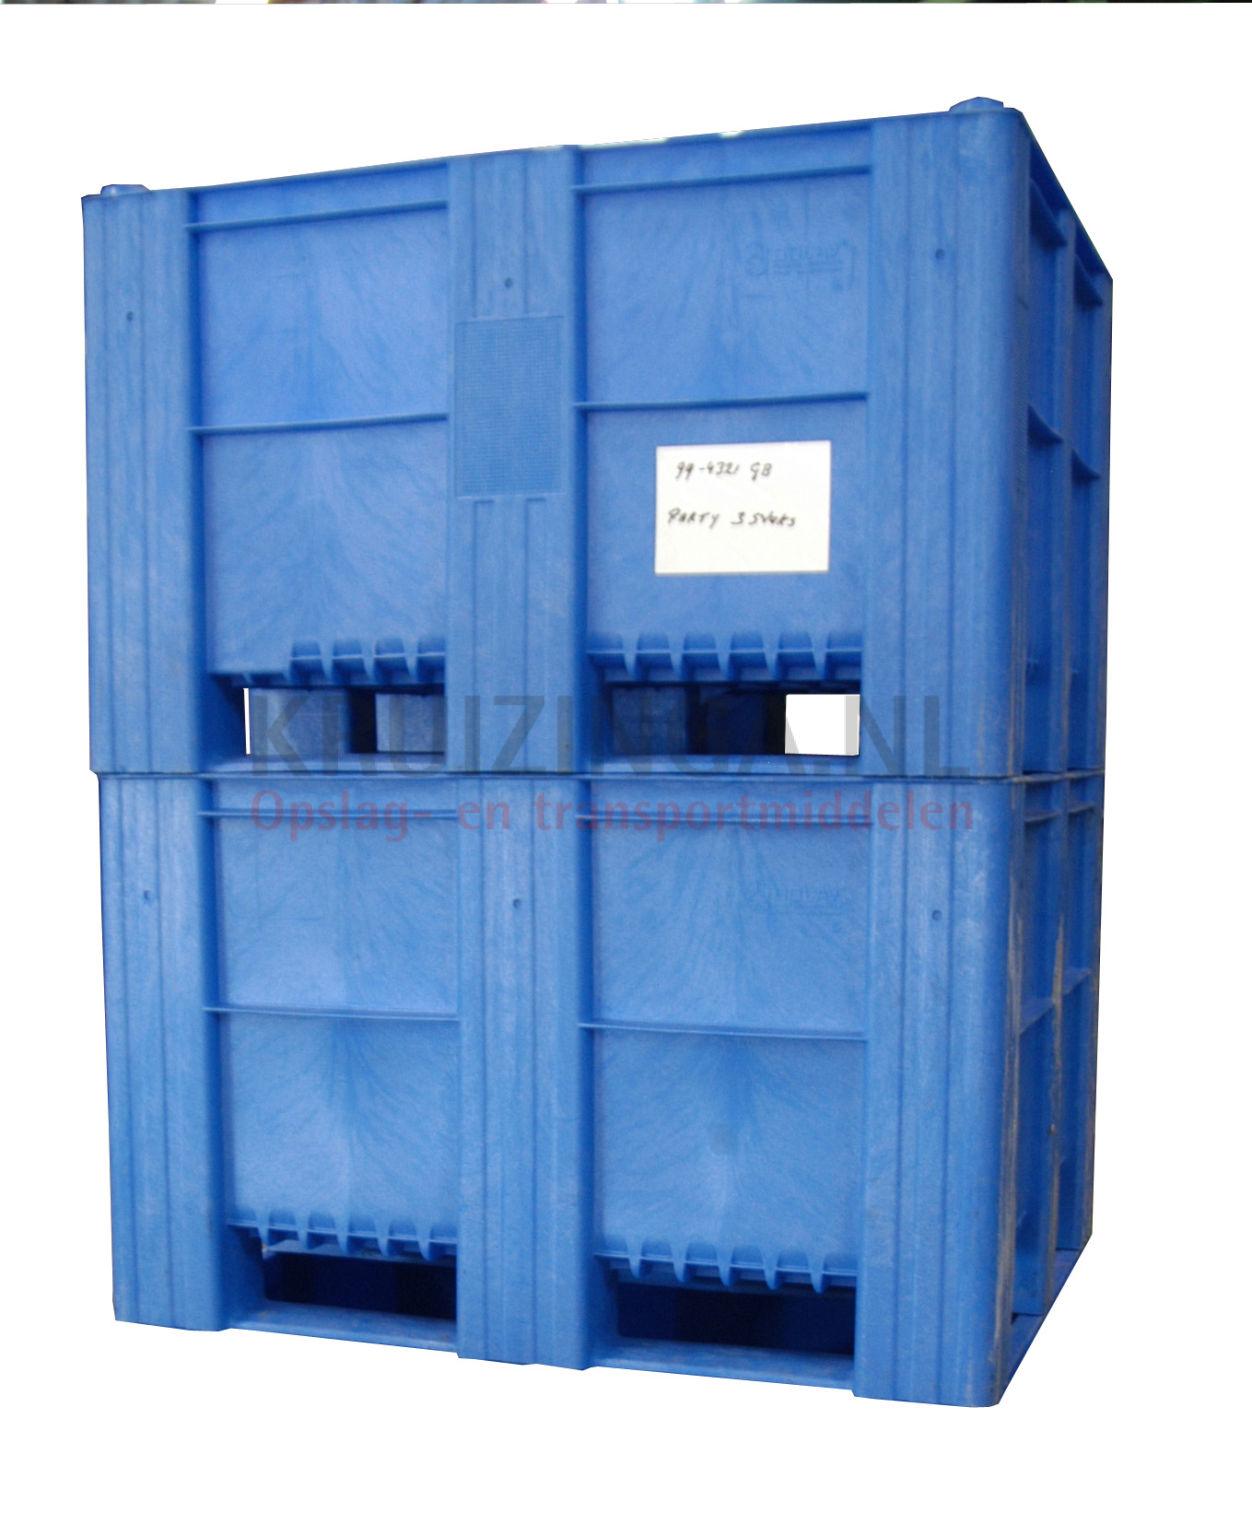 stapelboxen kunststoff stapelbar restbestand angebote gebraucht 120. Black Bedroom Furniture Sets. Home Design Ideas